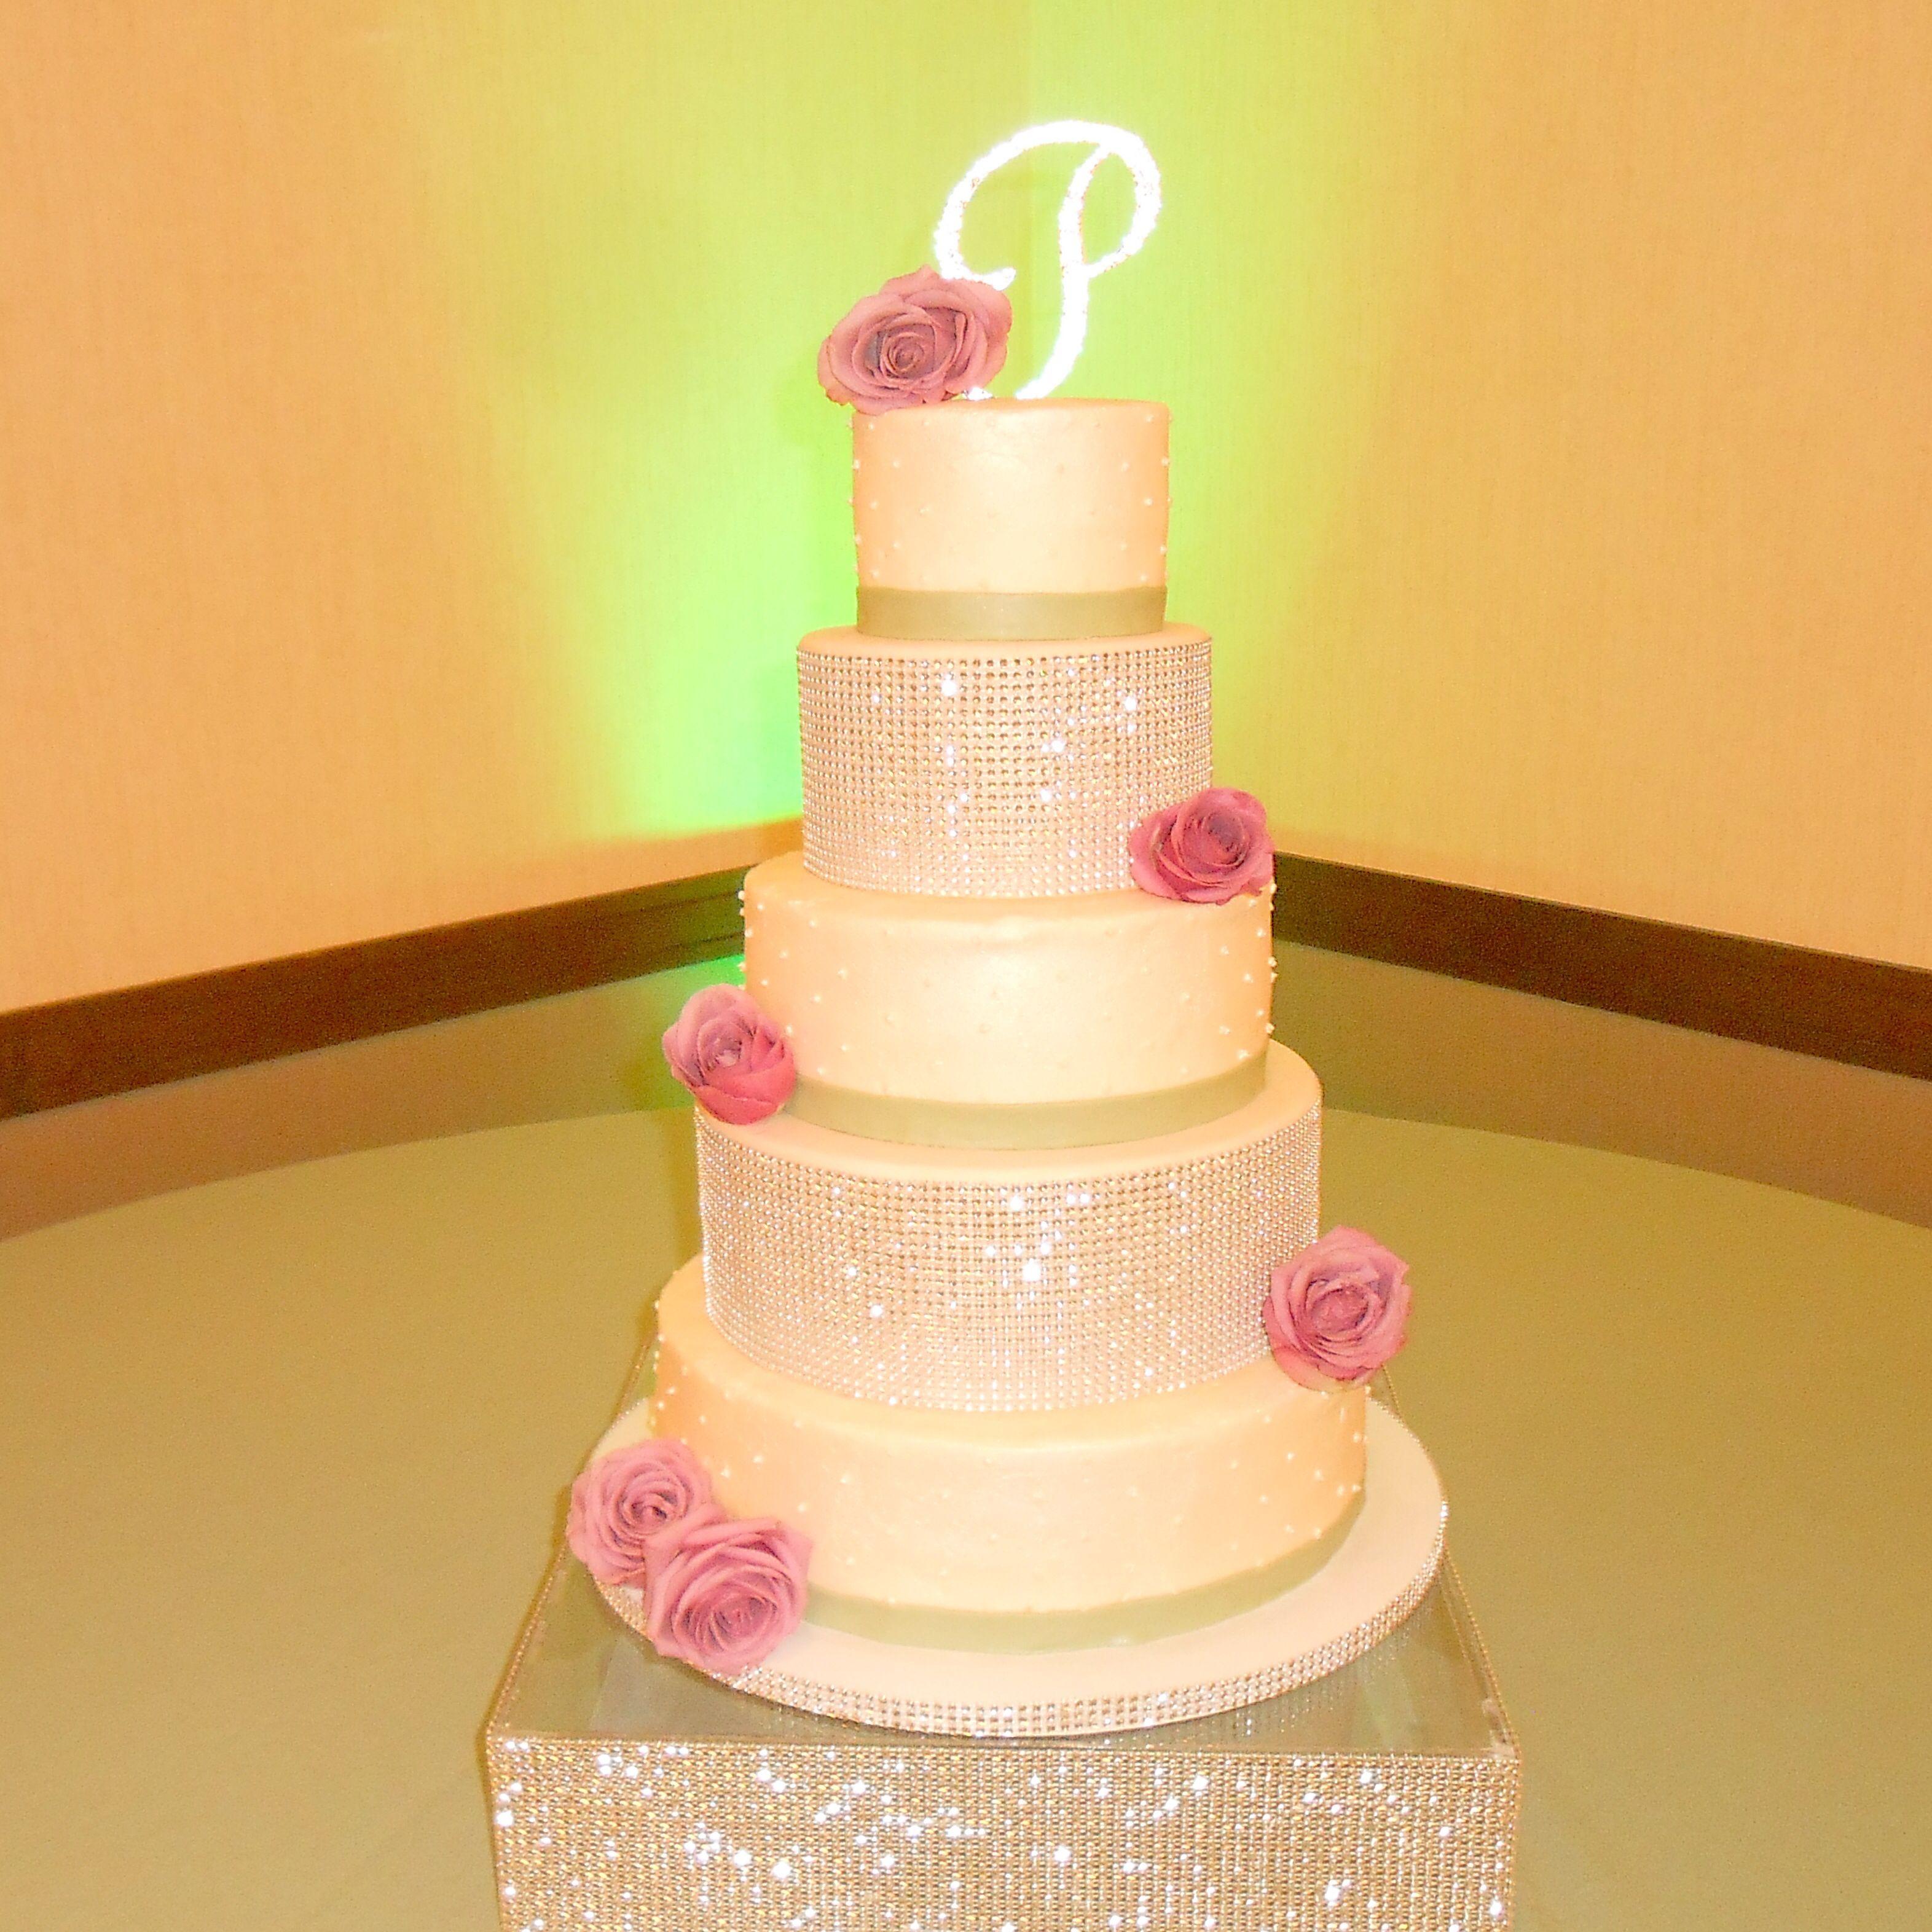 Bling Wedding Cakes, Cake, Beautiful